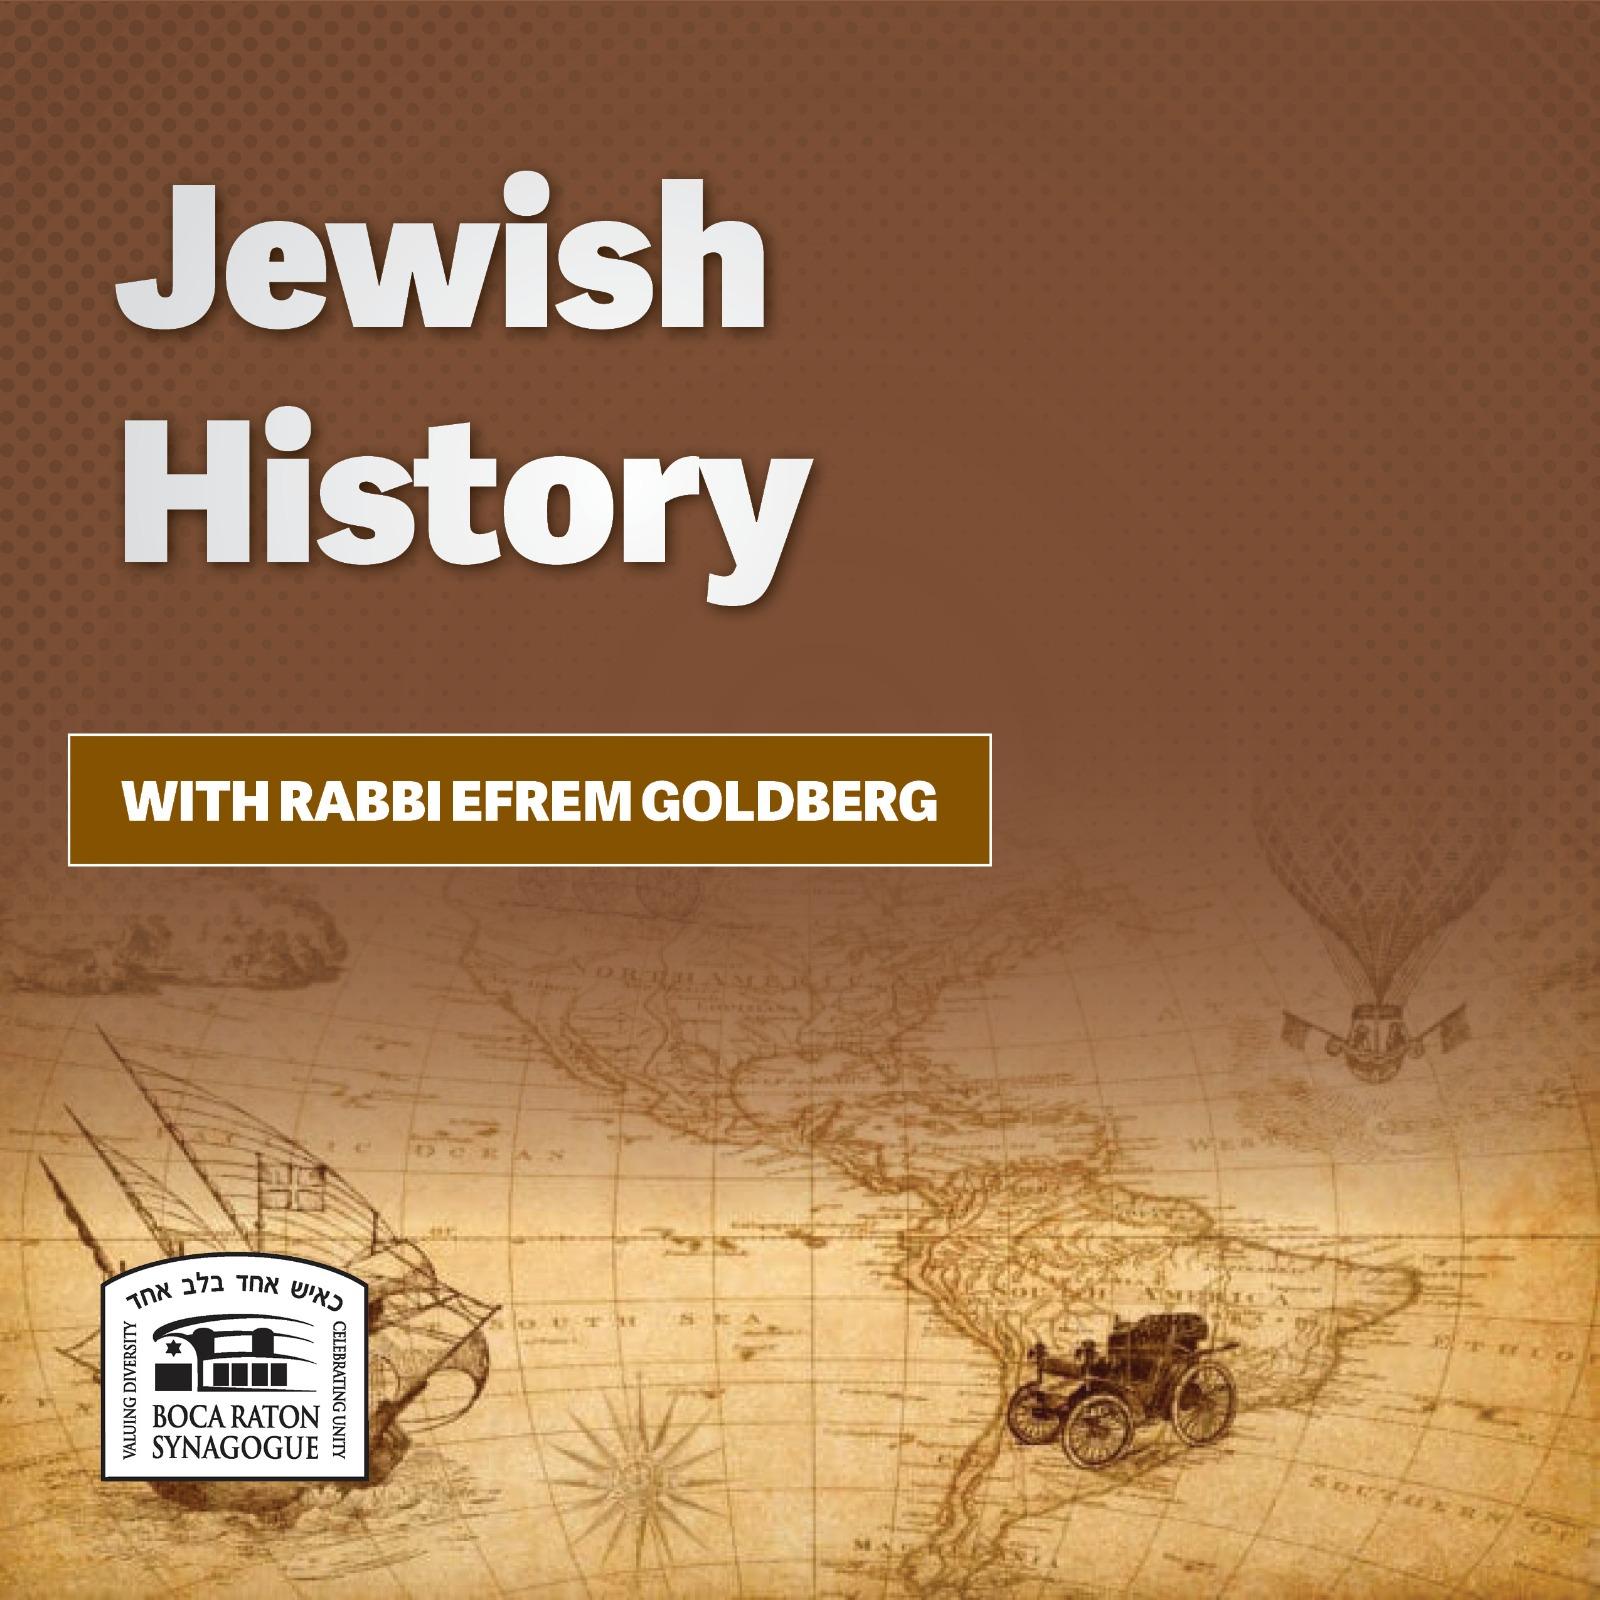 Listen: Jewish History